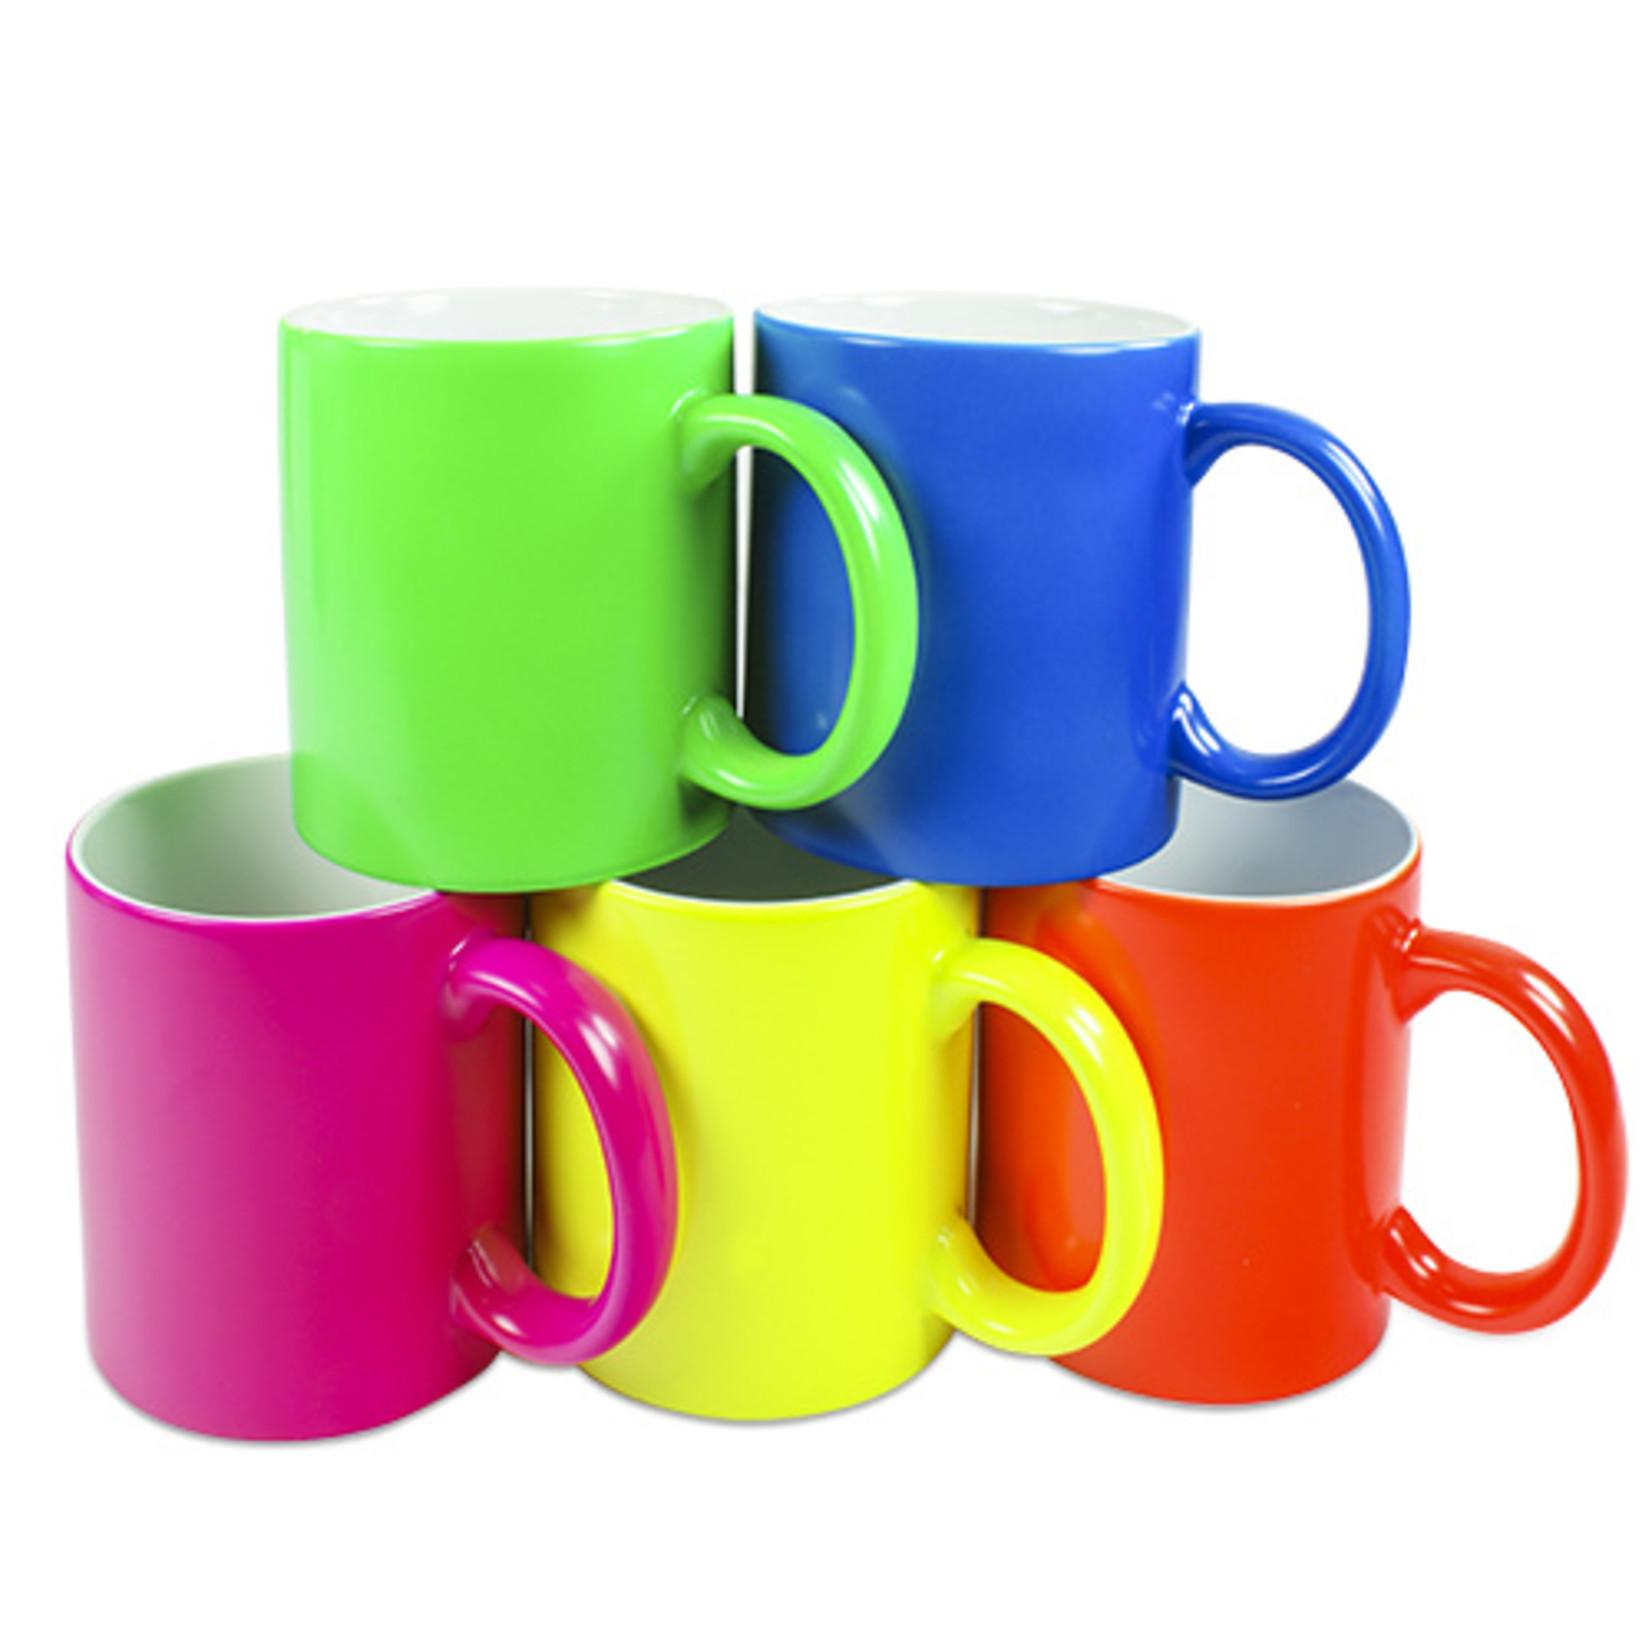 neon koffiemok met print